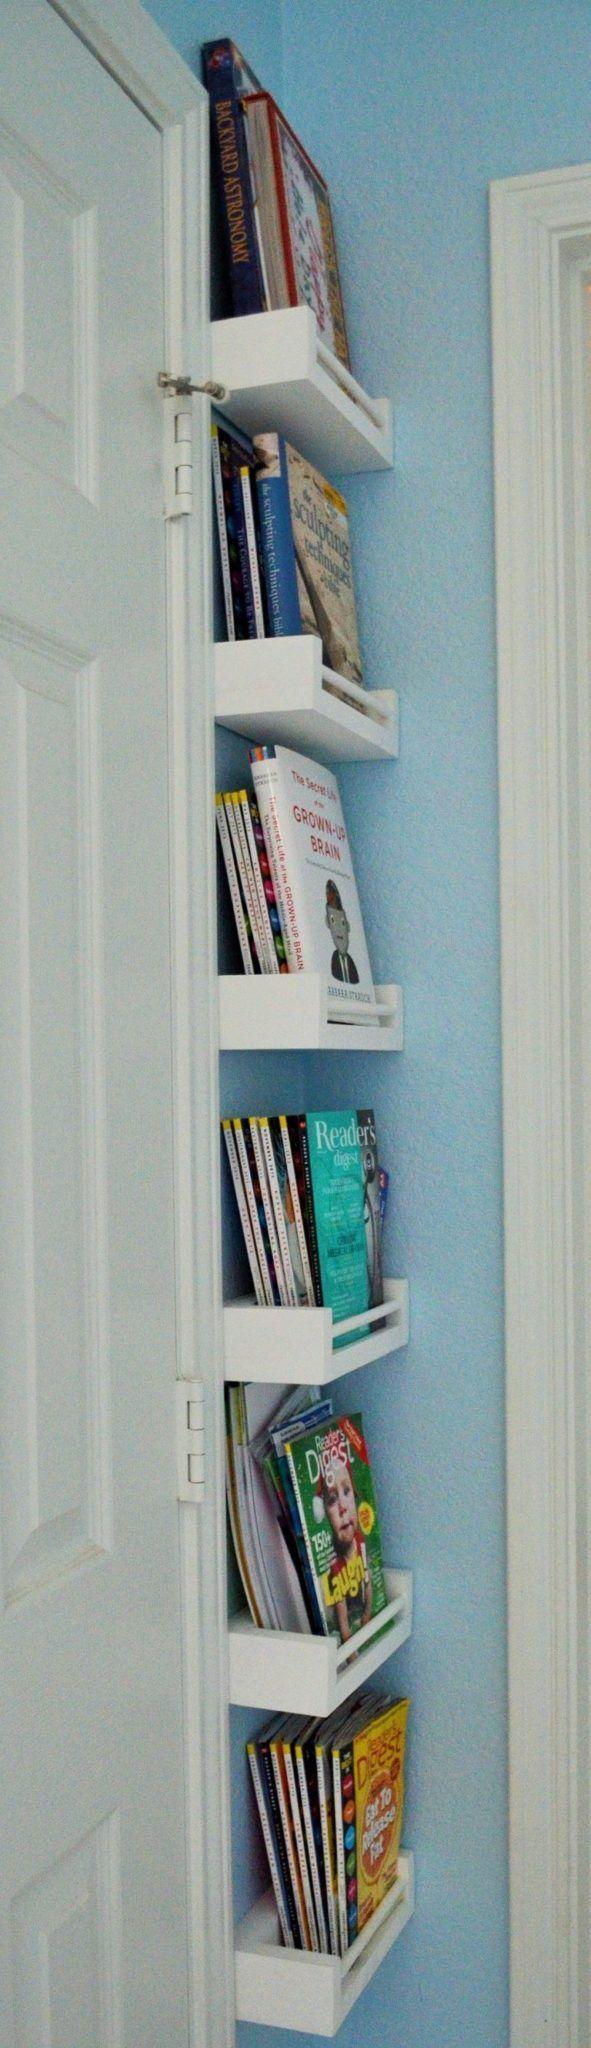 30 Charming And Space Saving Space Saving Corner Shelf Design Ideas In 2020 Storage Kids Room Bedroom Diy Small Bookshelf